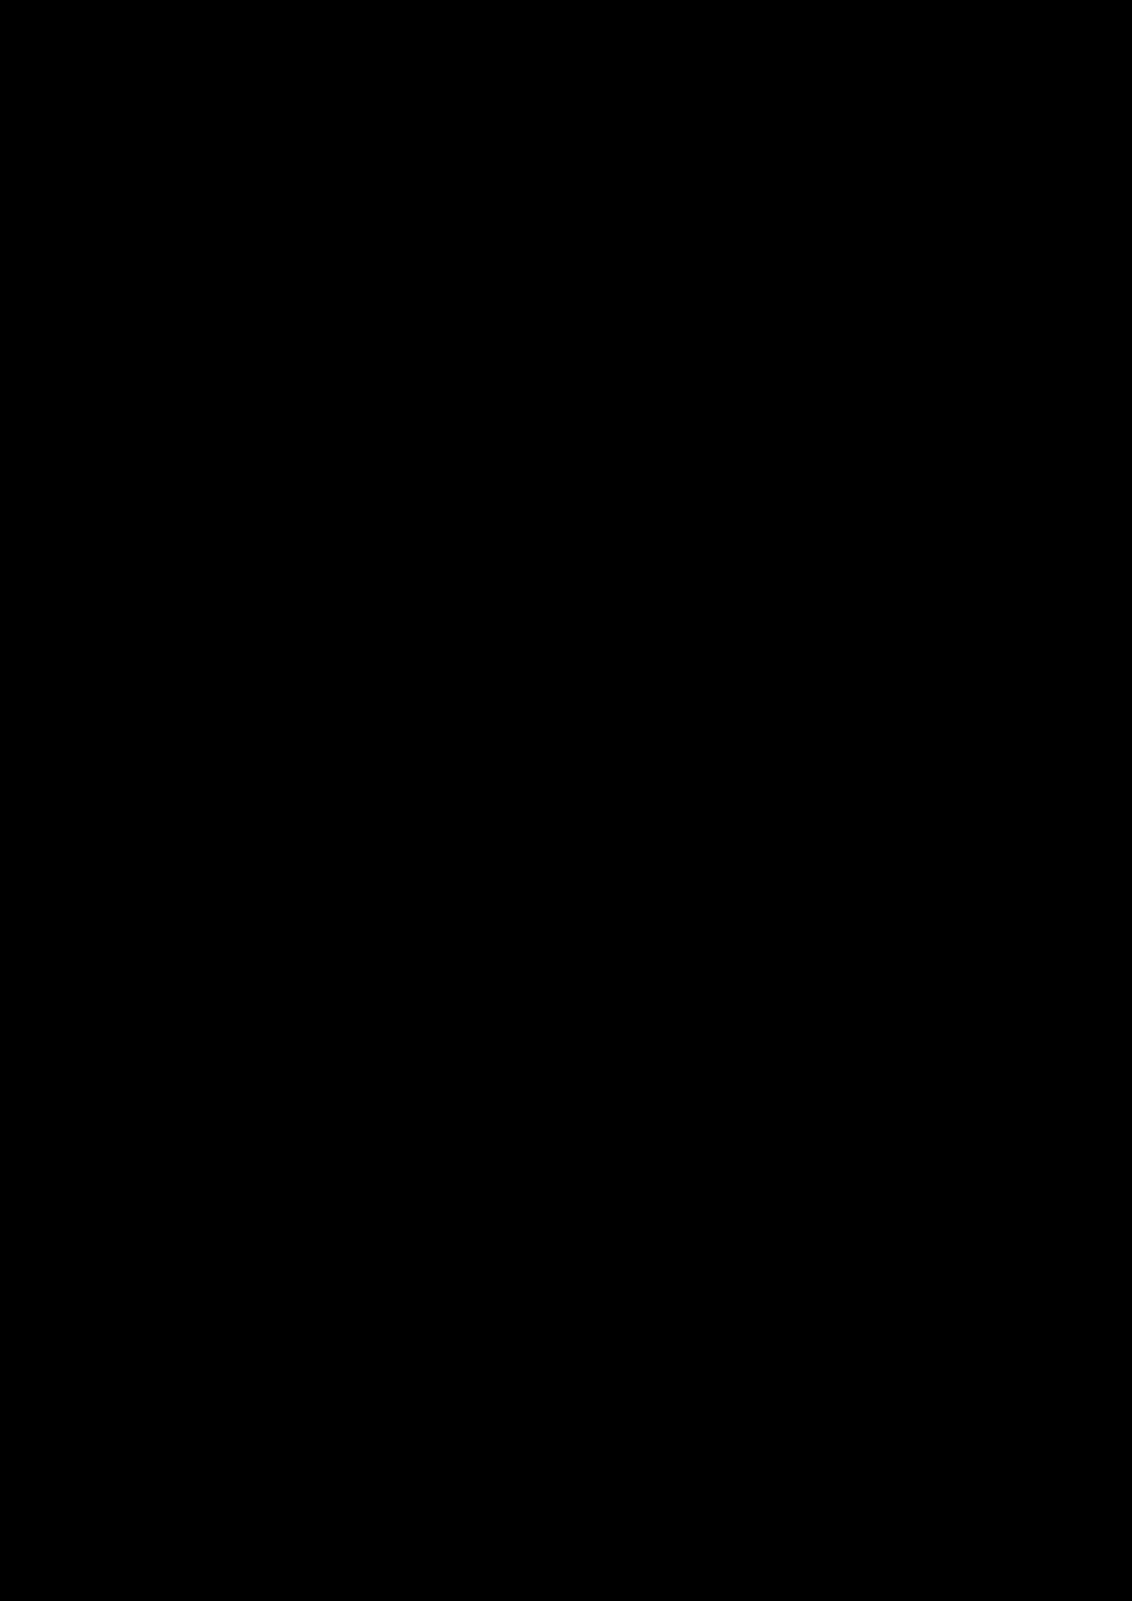 Romans o sleze slide, Image 31